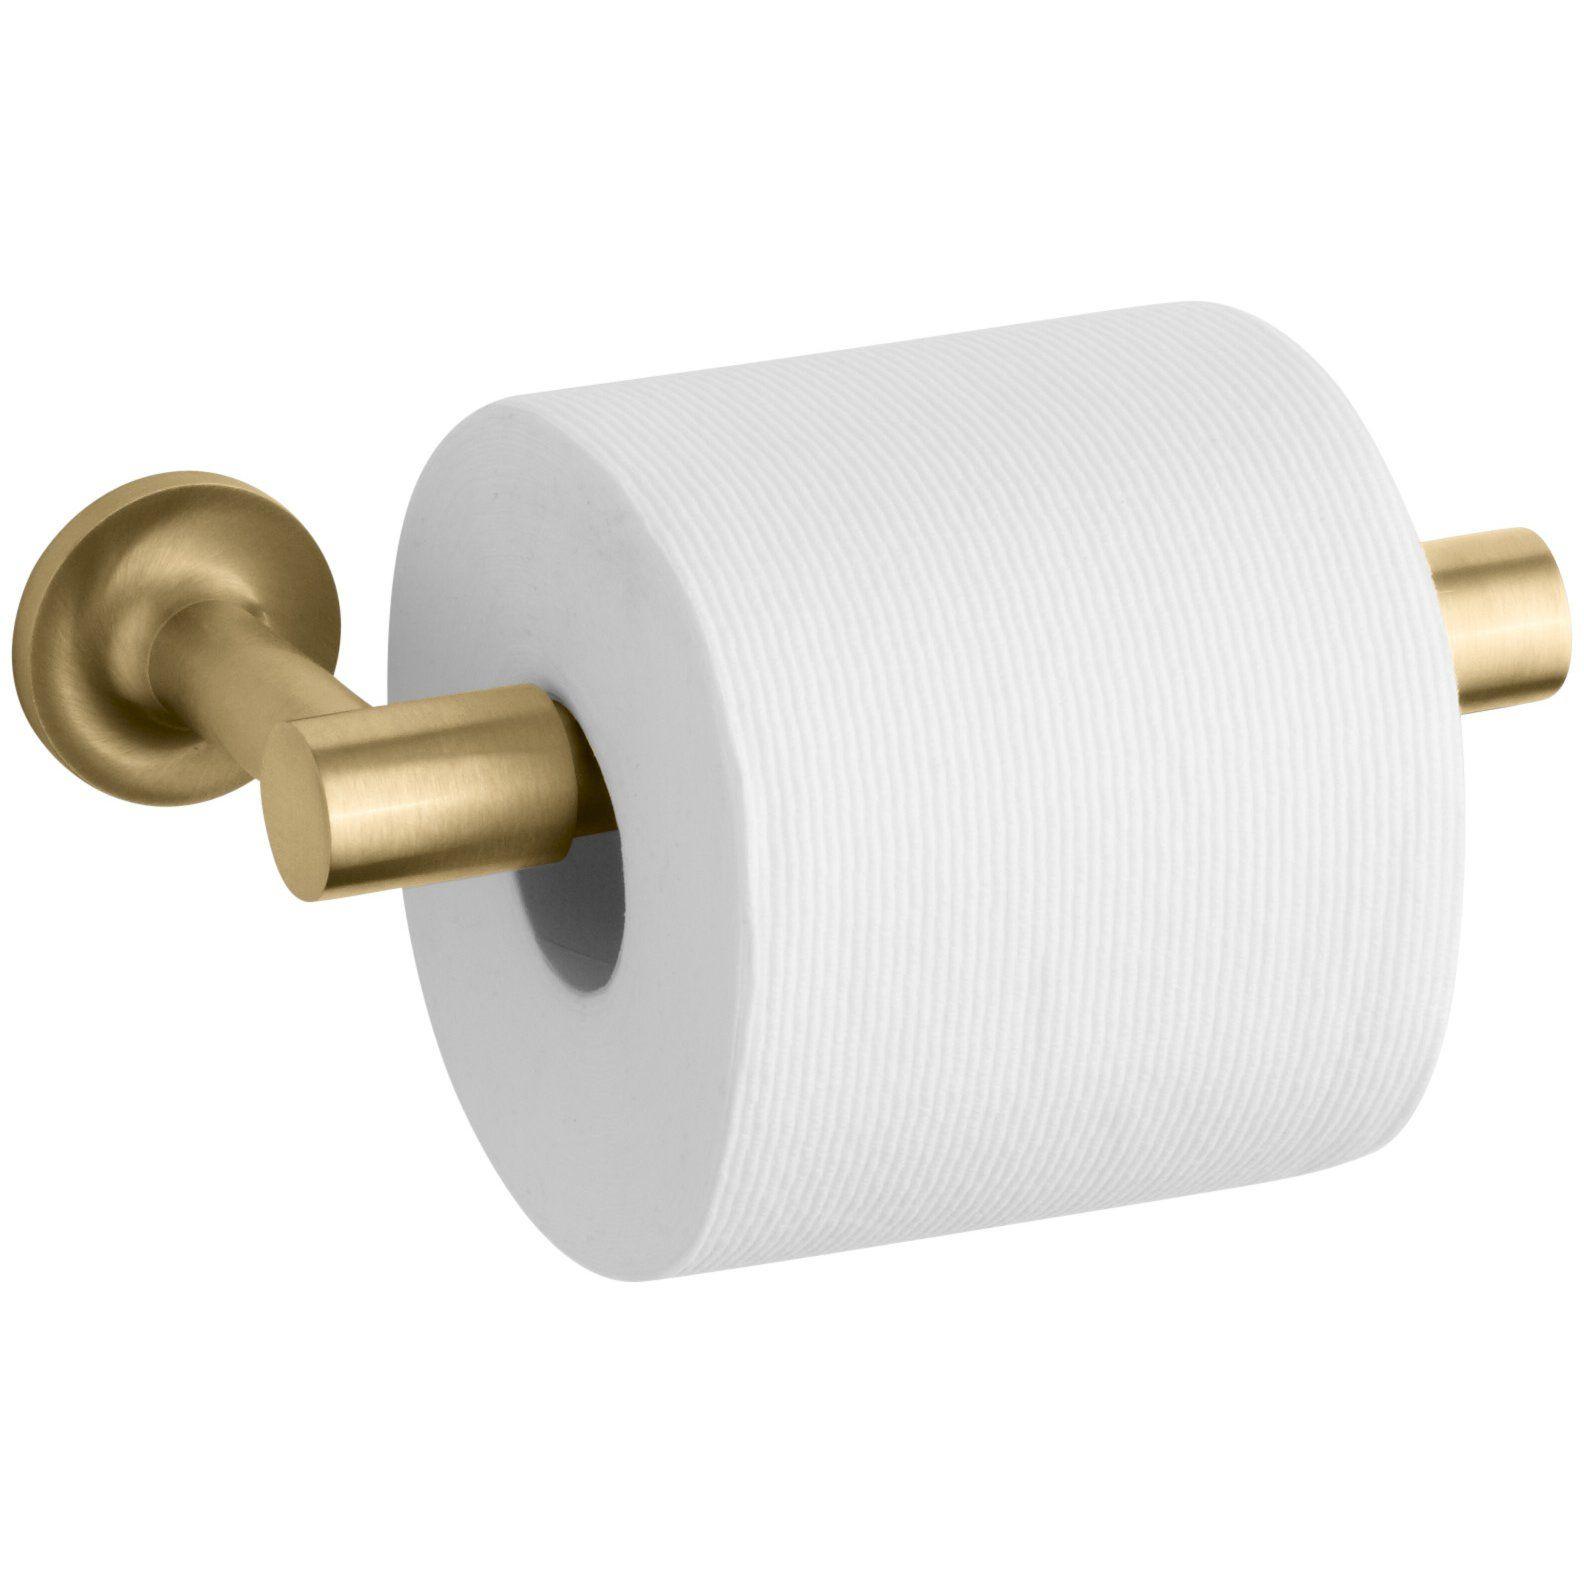 Purist Pivoting Toilet Tissue Holder Toilet Paper Holder Toilet Paper Holder Uses Kohler Purist